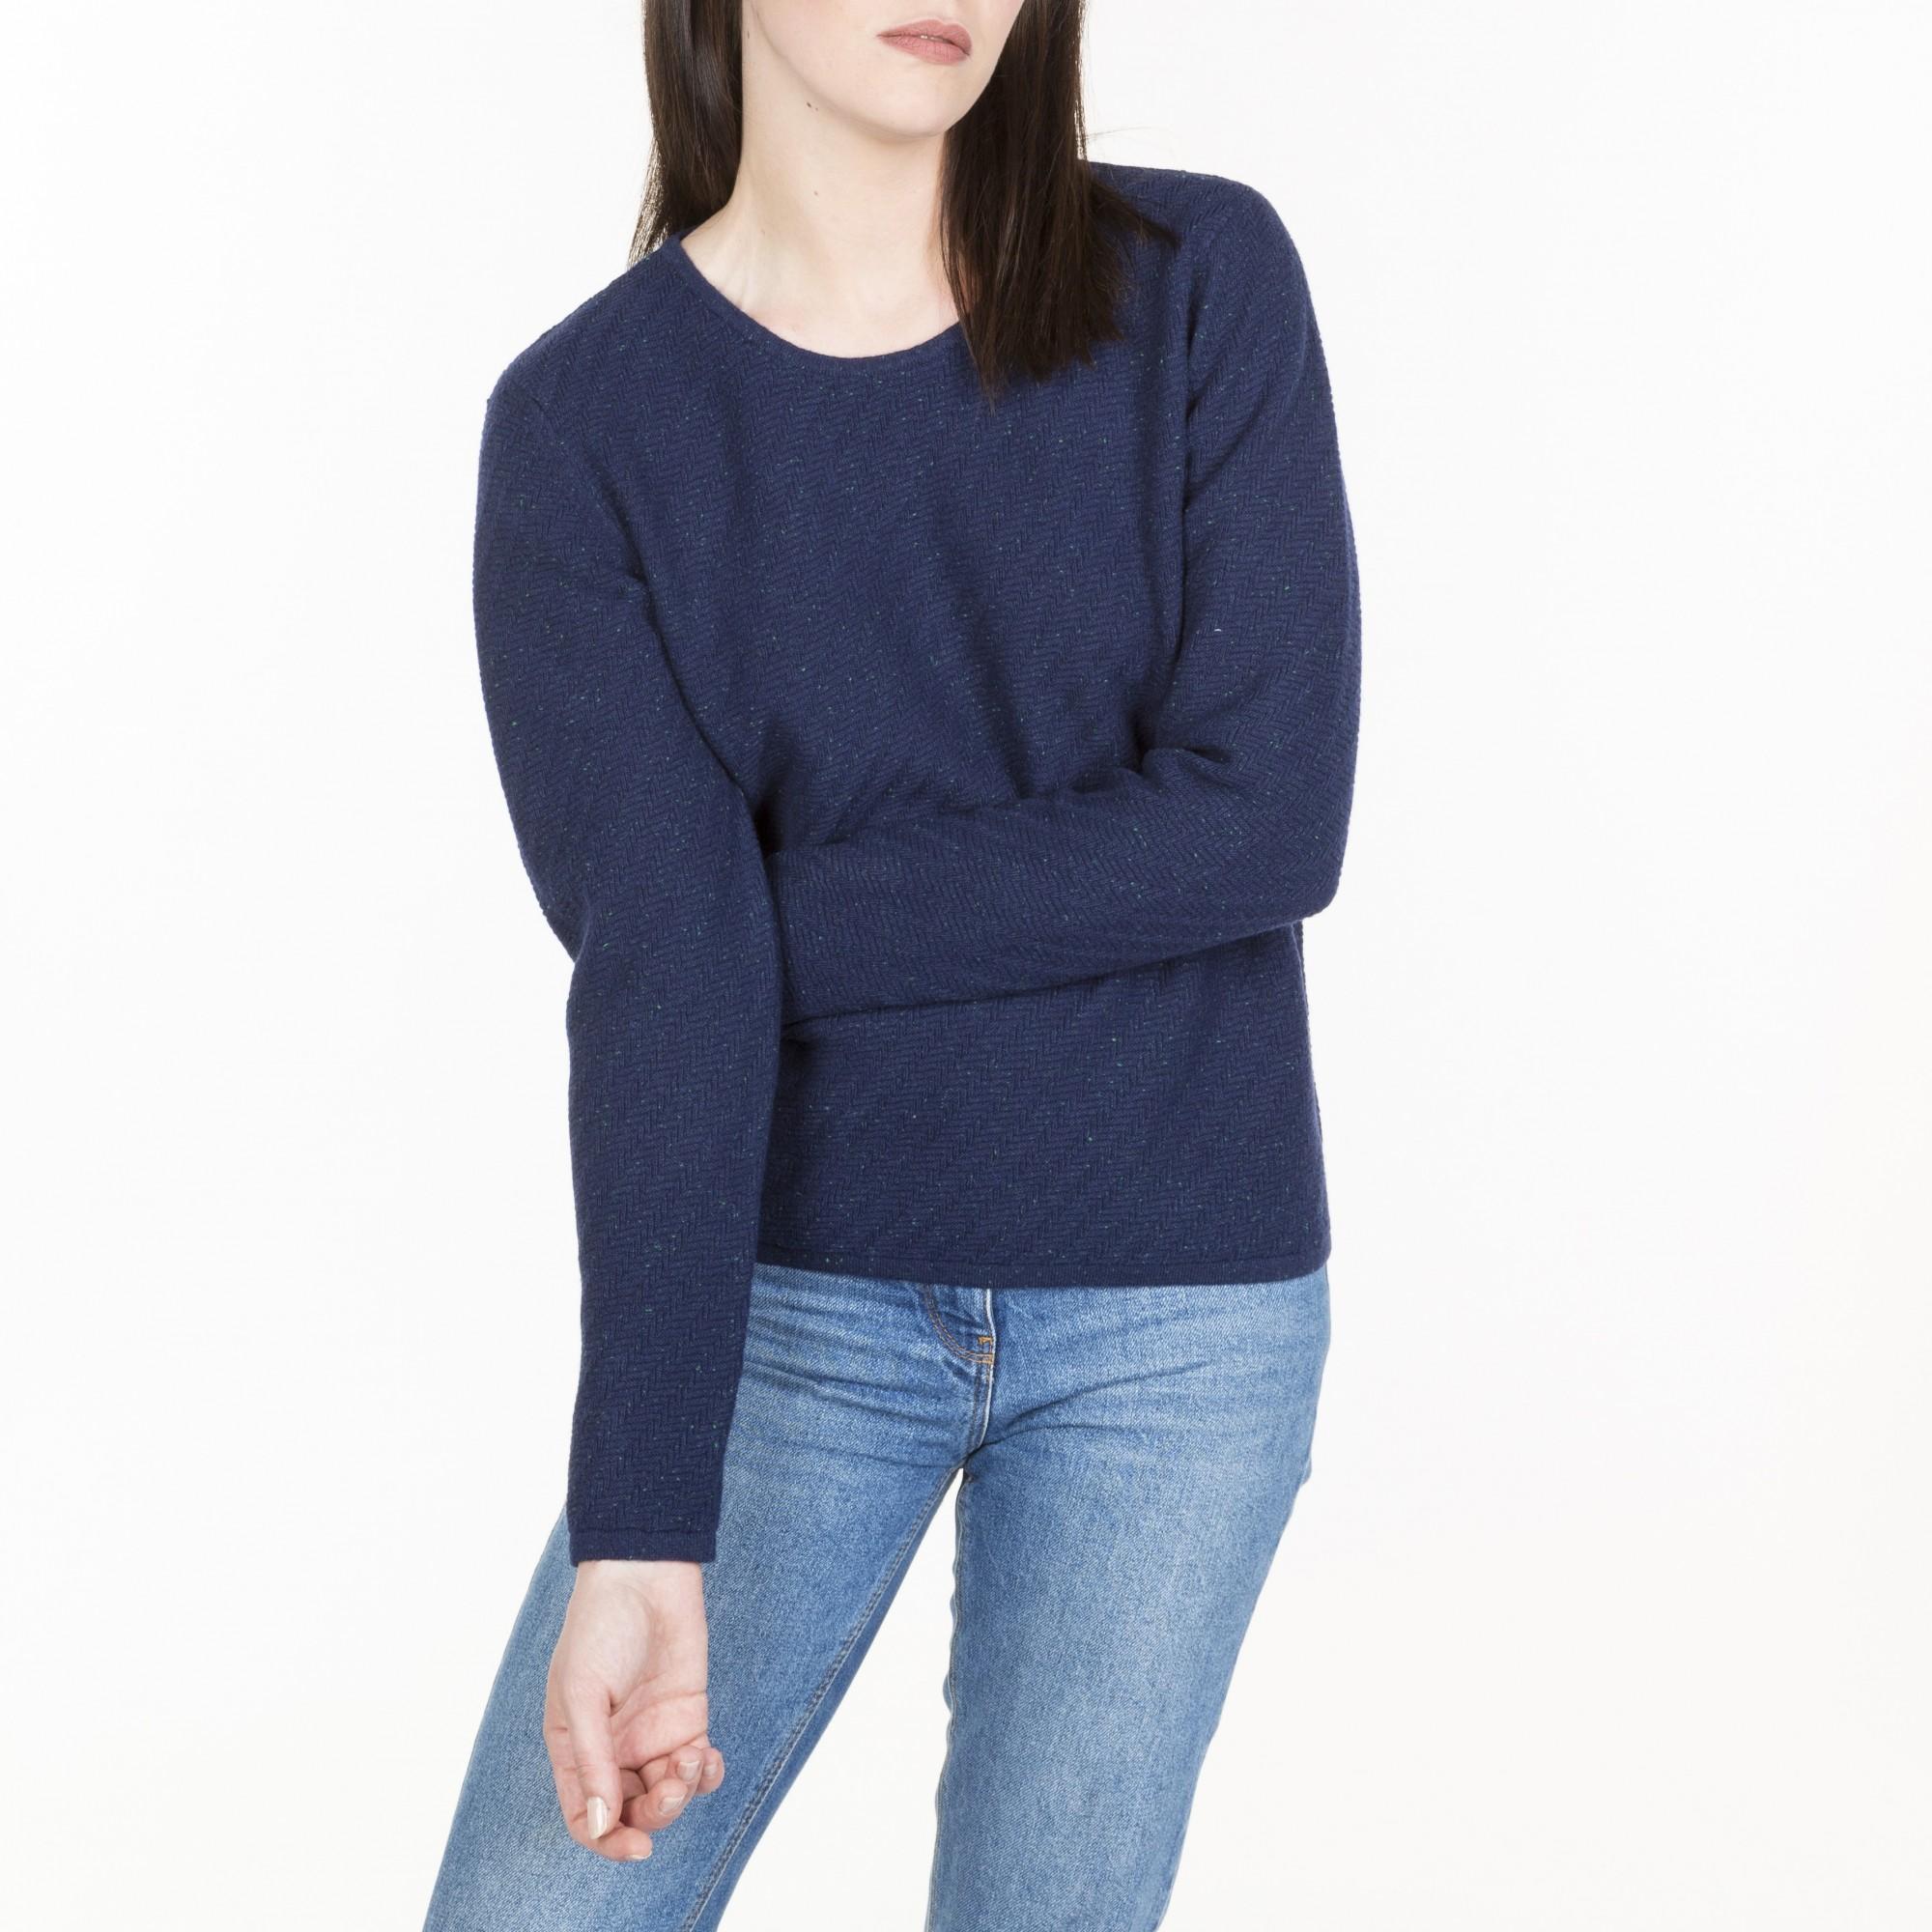 Spotted Fancy Sweater Muriel Maison Montagut